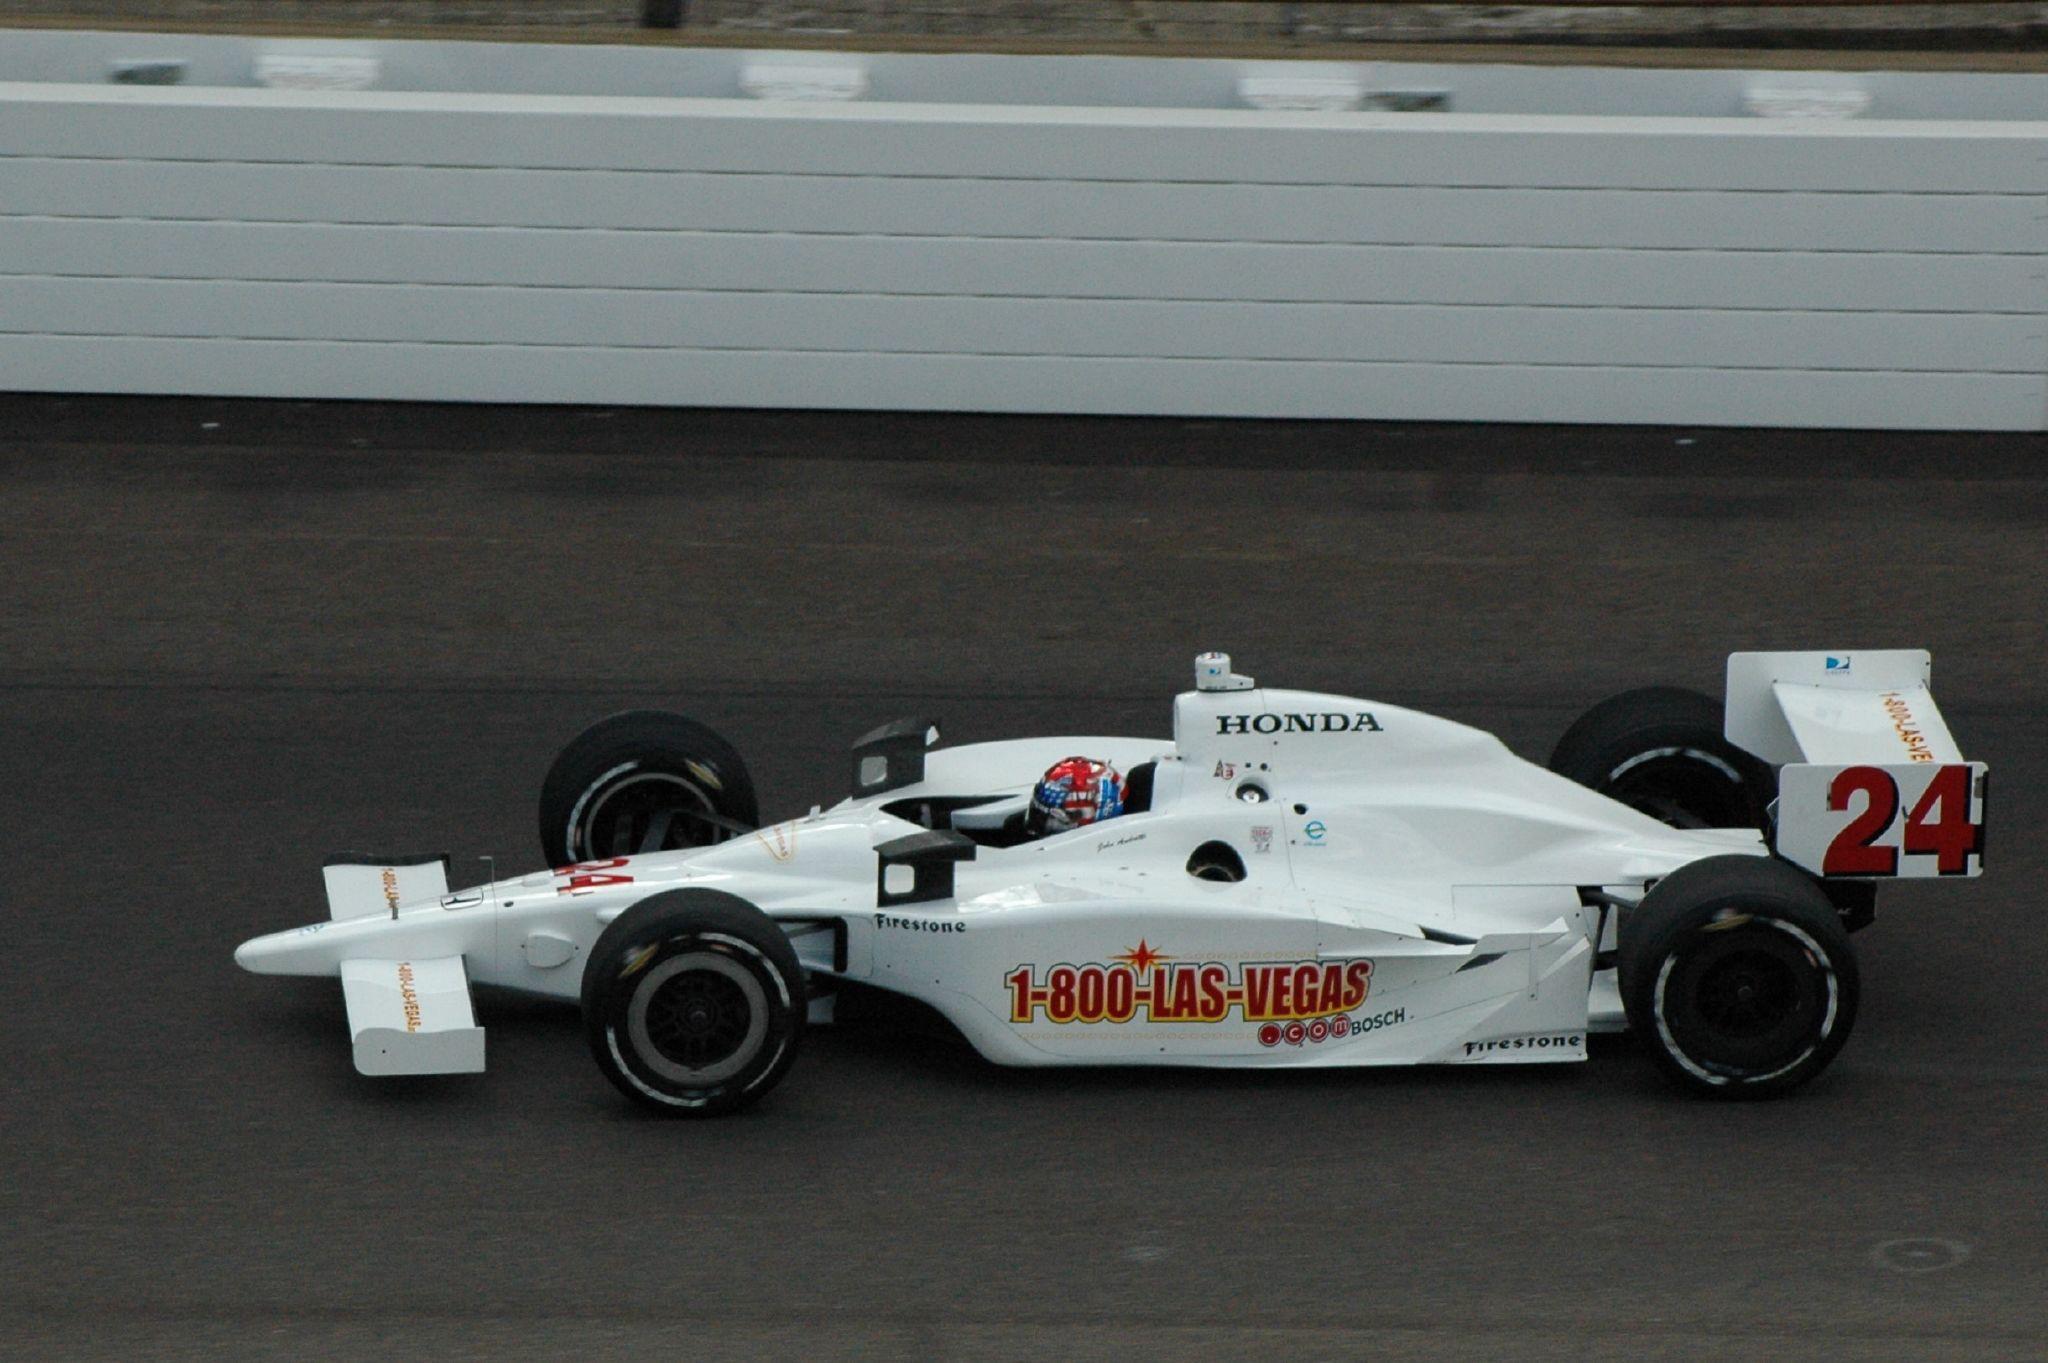 91 NHRA 37th US Nationals Indianapolis Raceway Park Drag Racing Mechanics Patch